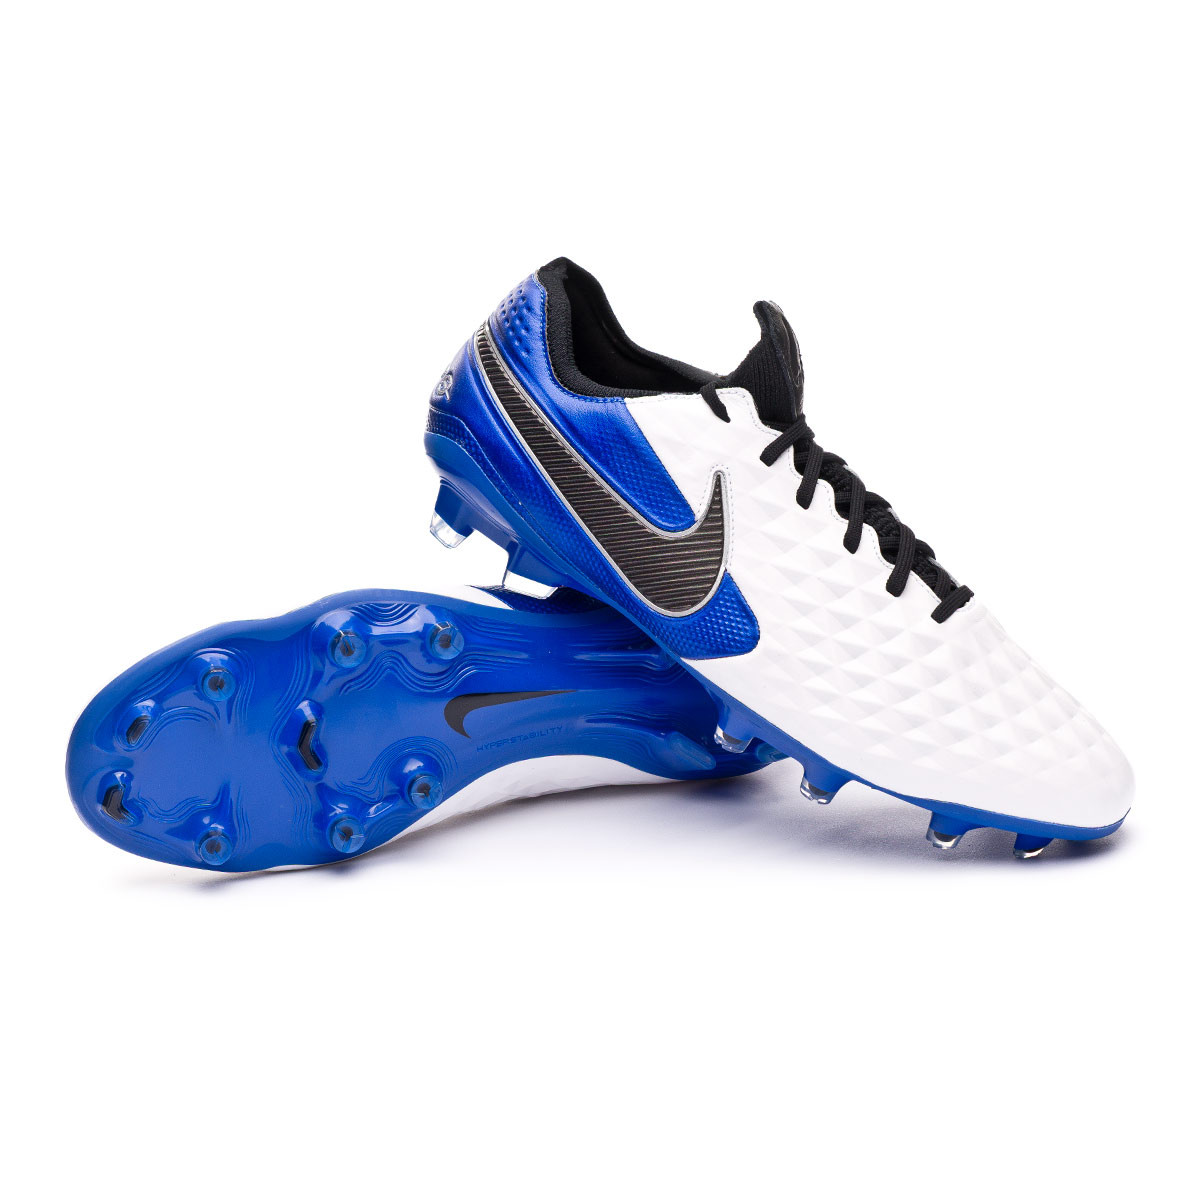 Microprocesador práctico Cerebro  Football Boots Nike Tiempo Legend VIII Elite FG White-Black-Hyper  royal-Metallic silver - Football store Fútbol Emotion